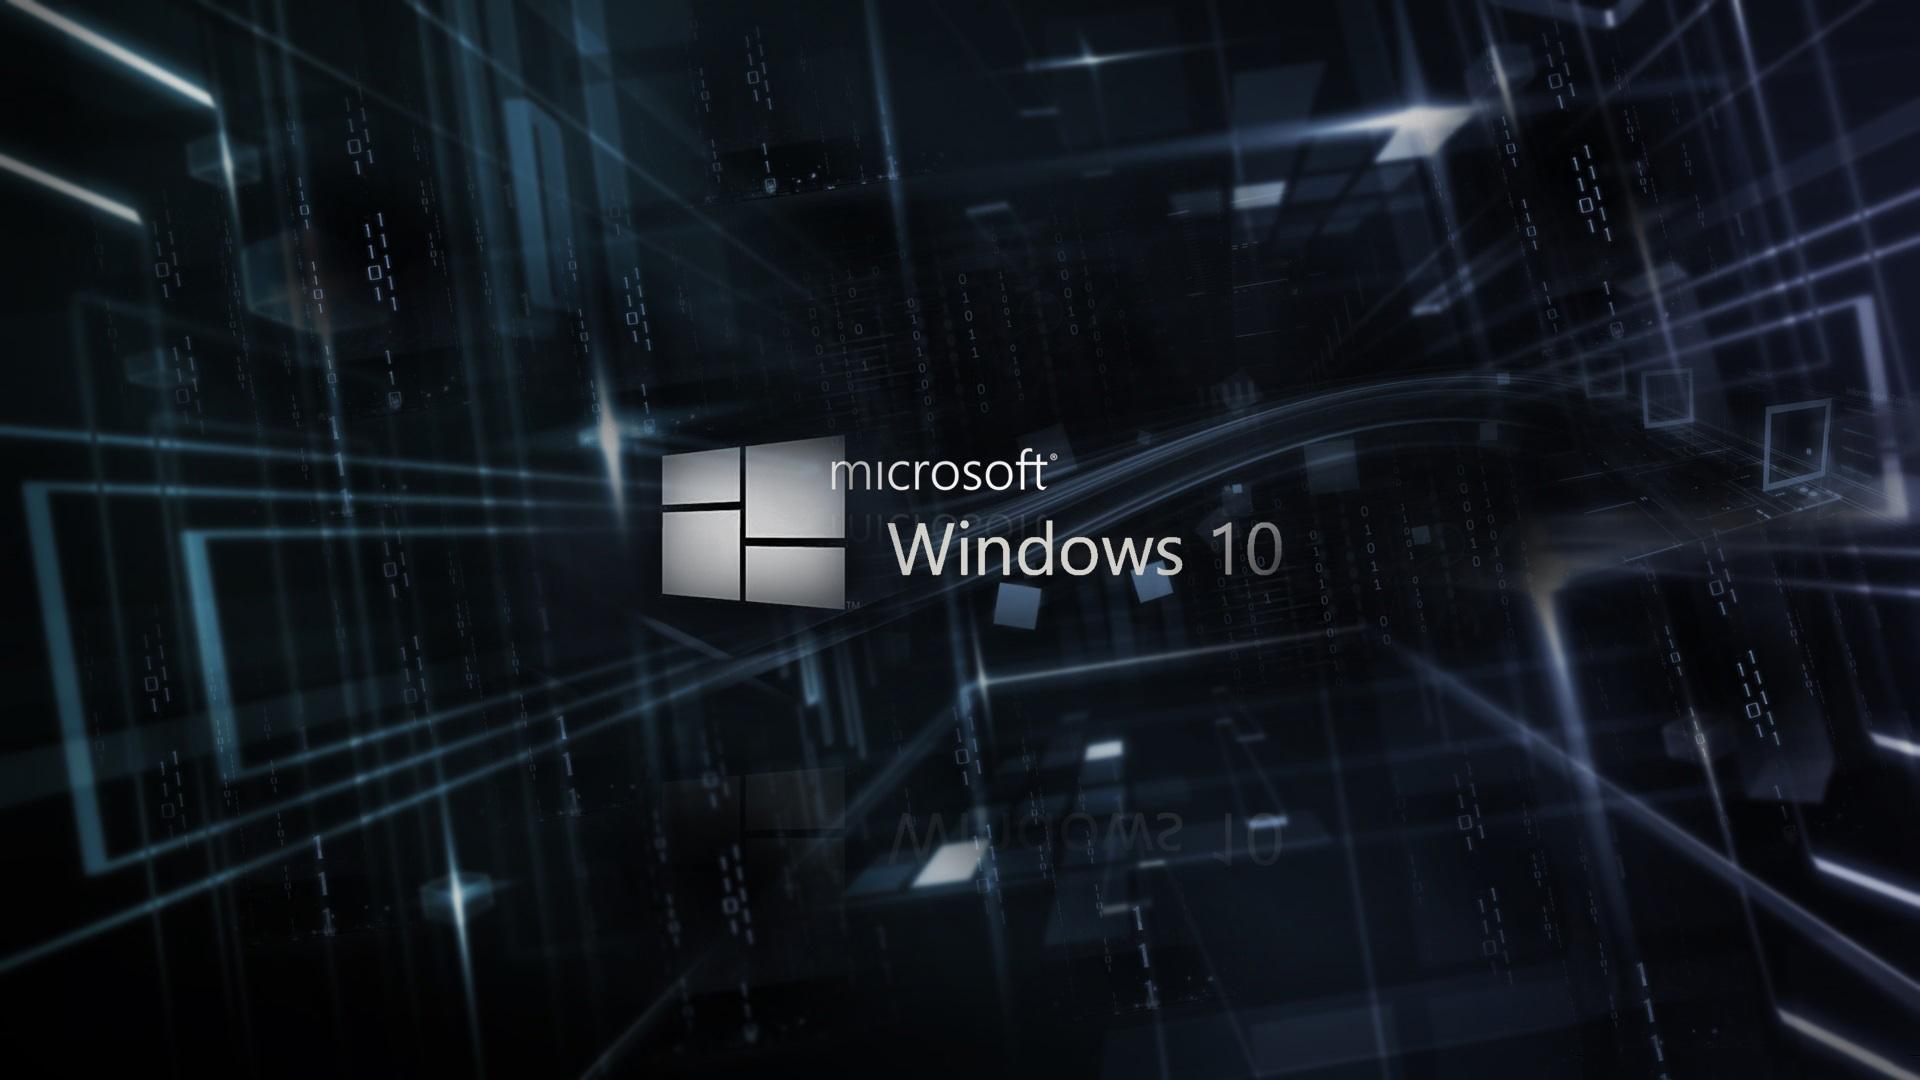 windows 10 desktop wallpaper 49909